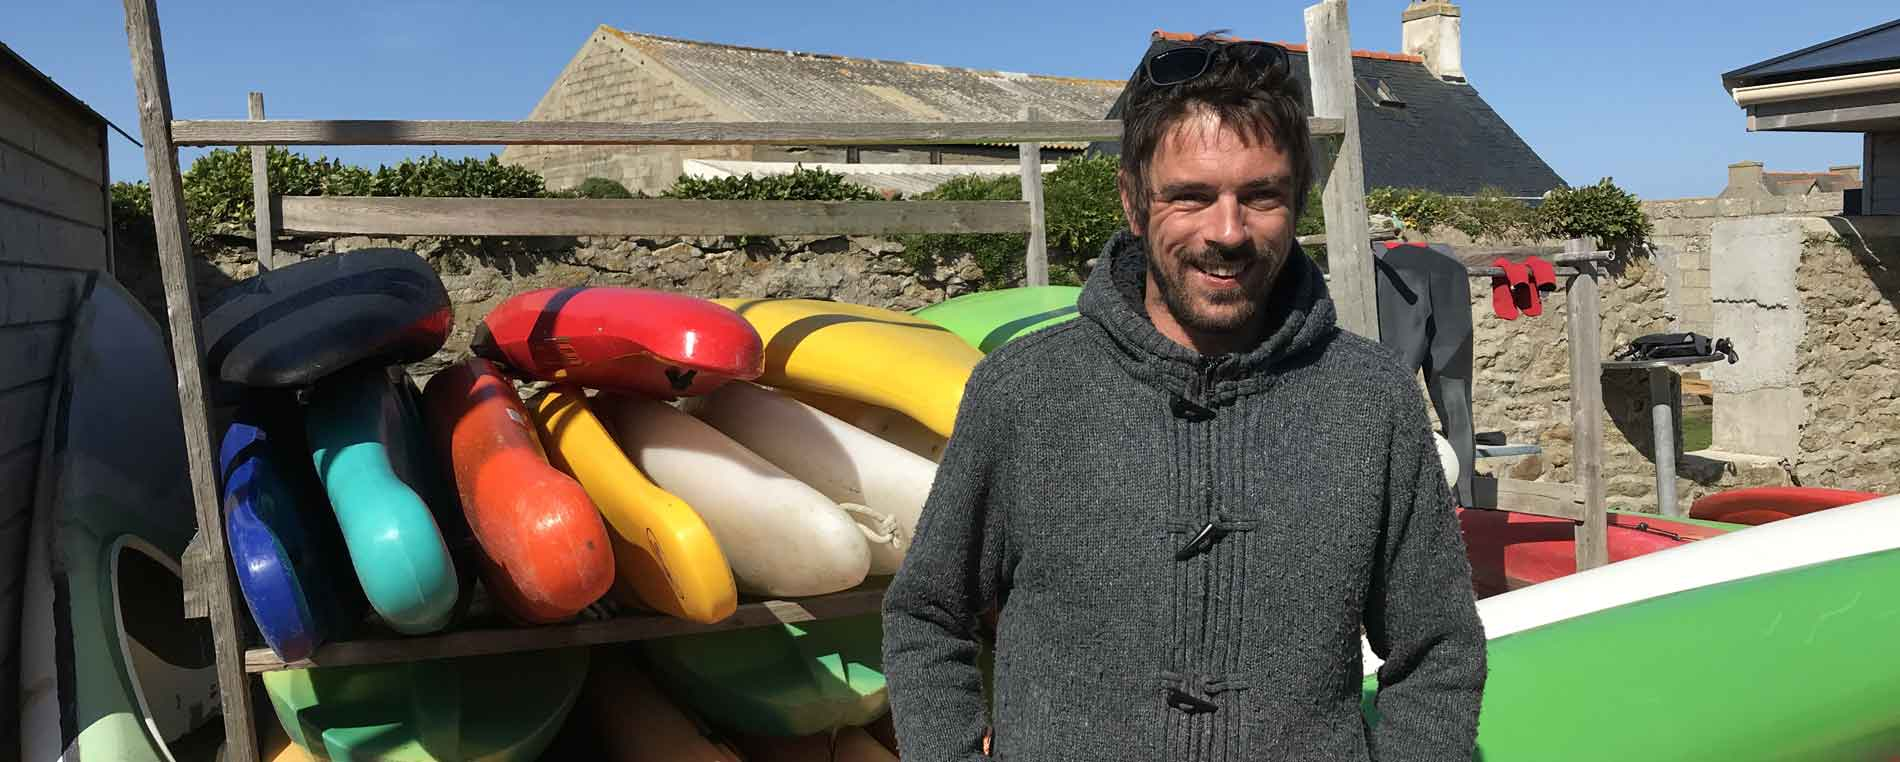 Pierre Portais